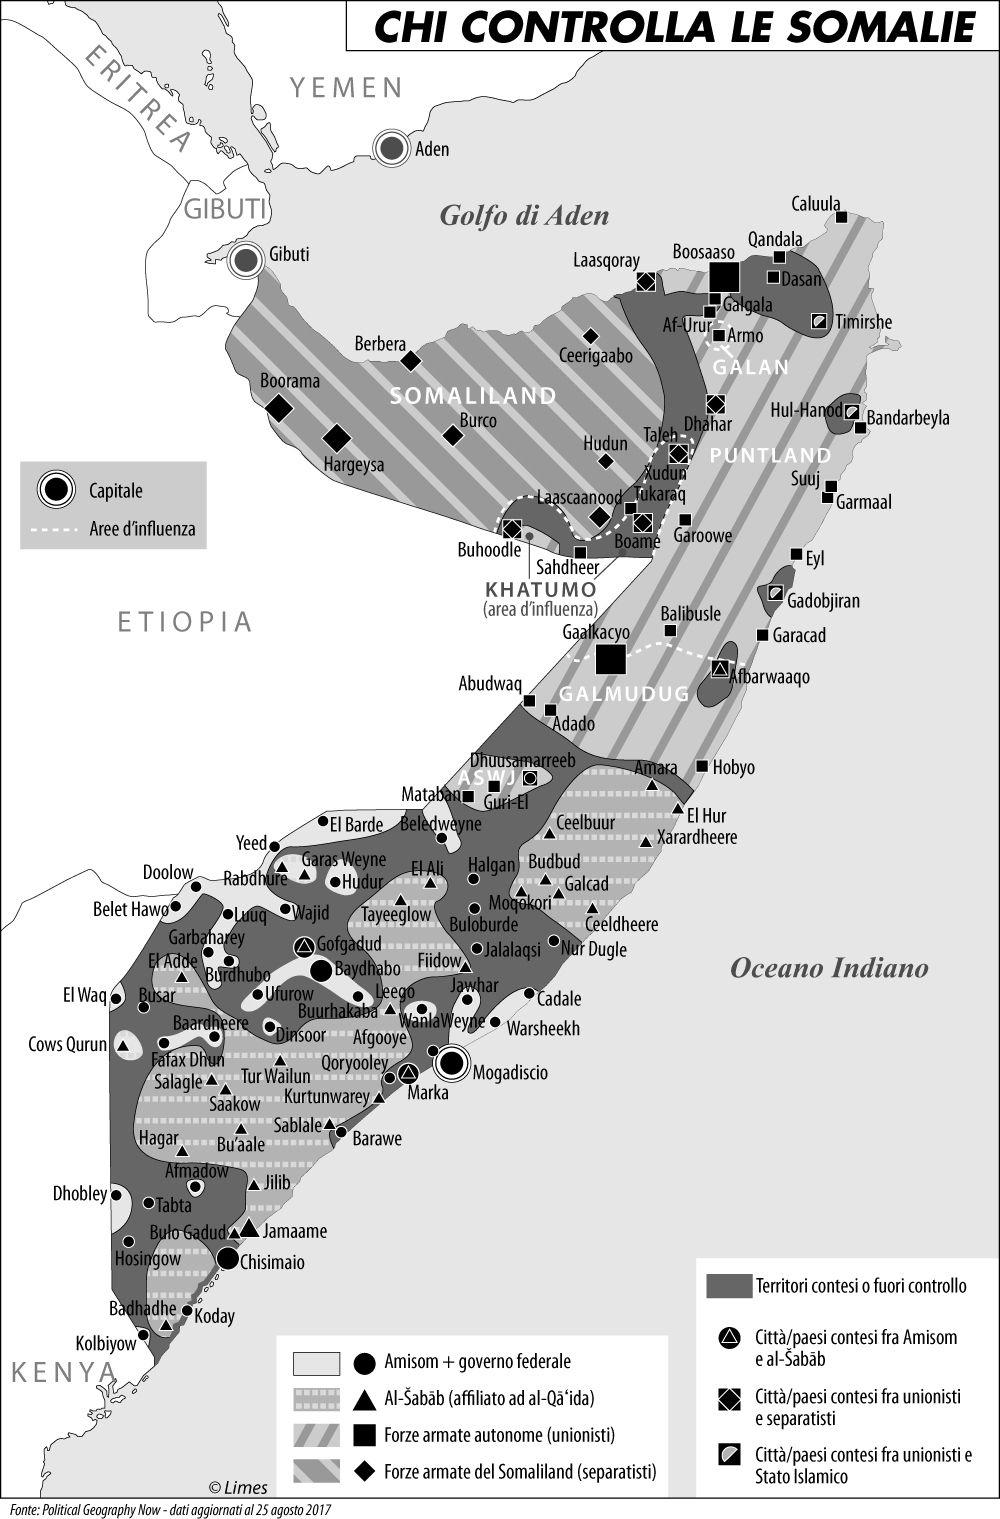 Chi controlla la Somalia b-n